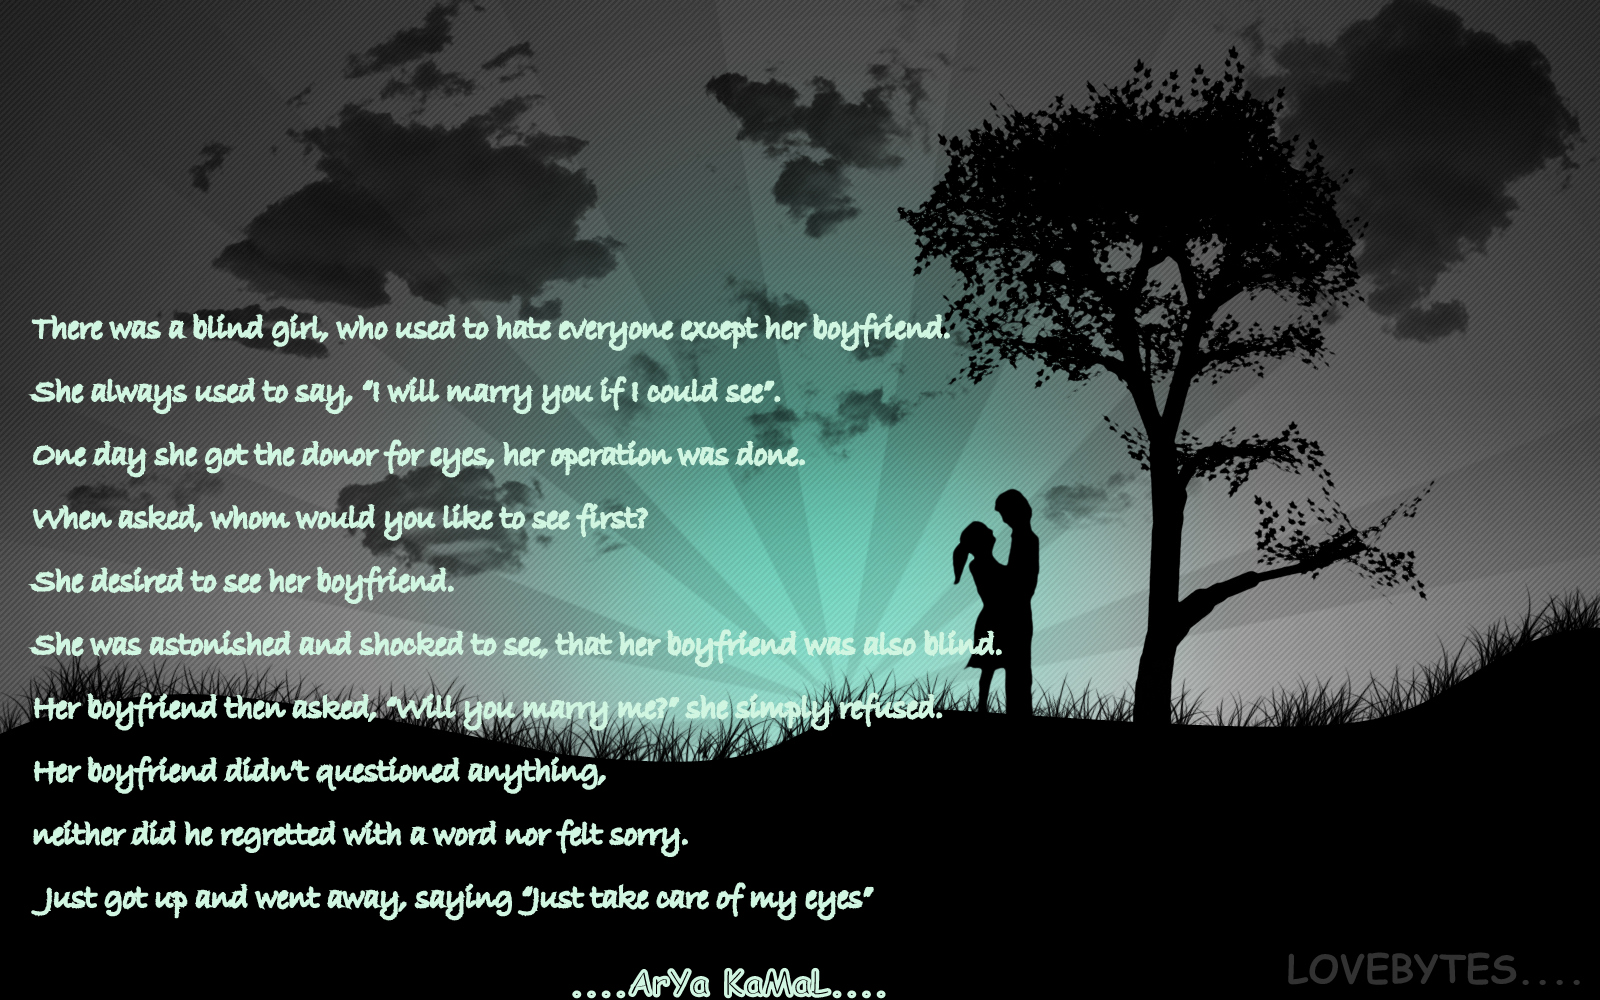 a-true-love-story.jpg